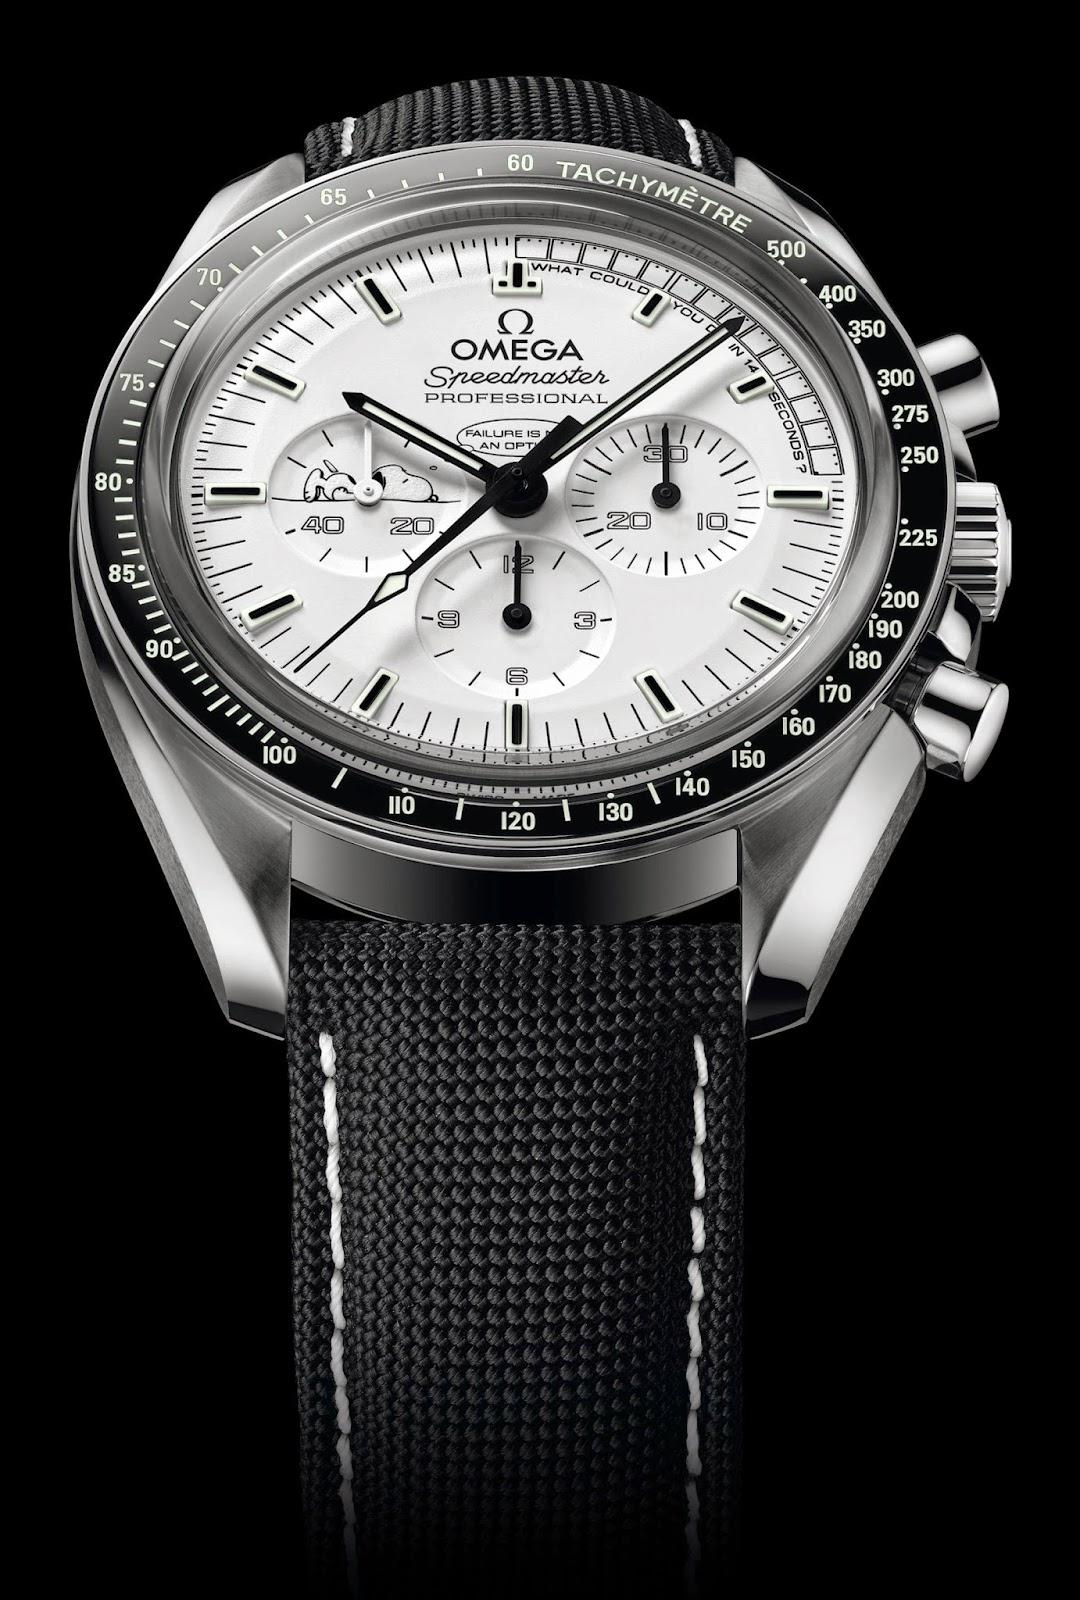 Omega Speedmaster Apollo 13 Silver Snoopy Award copy watch